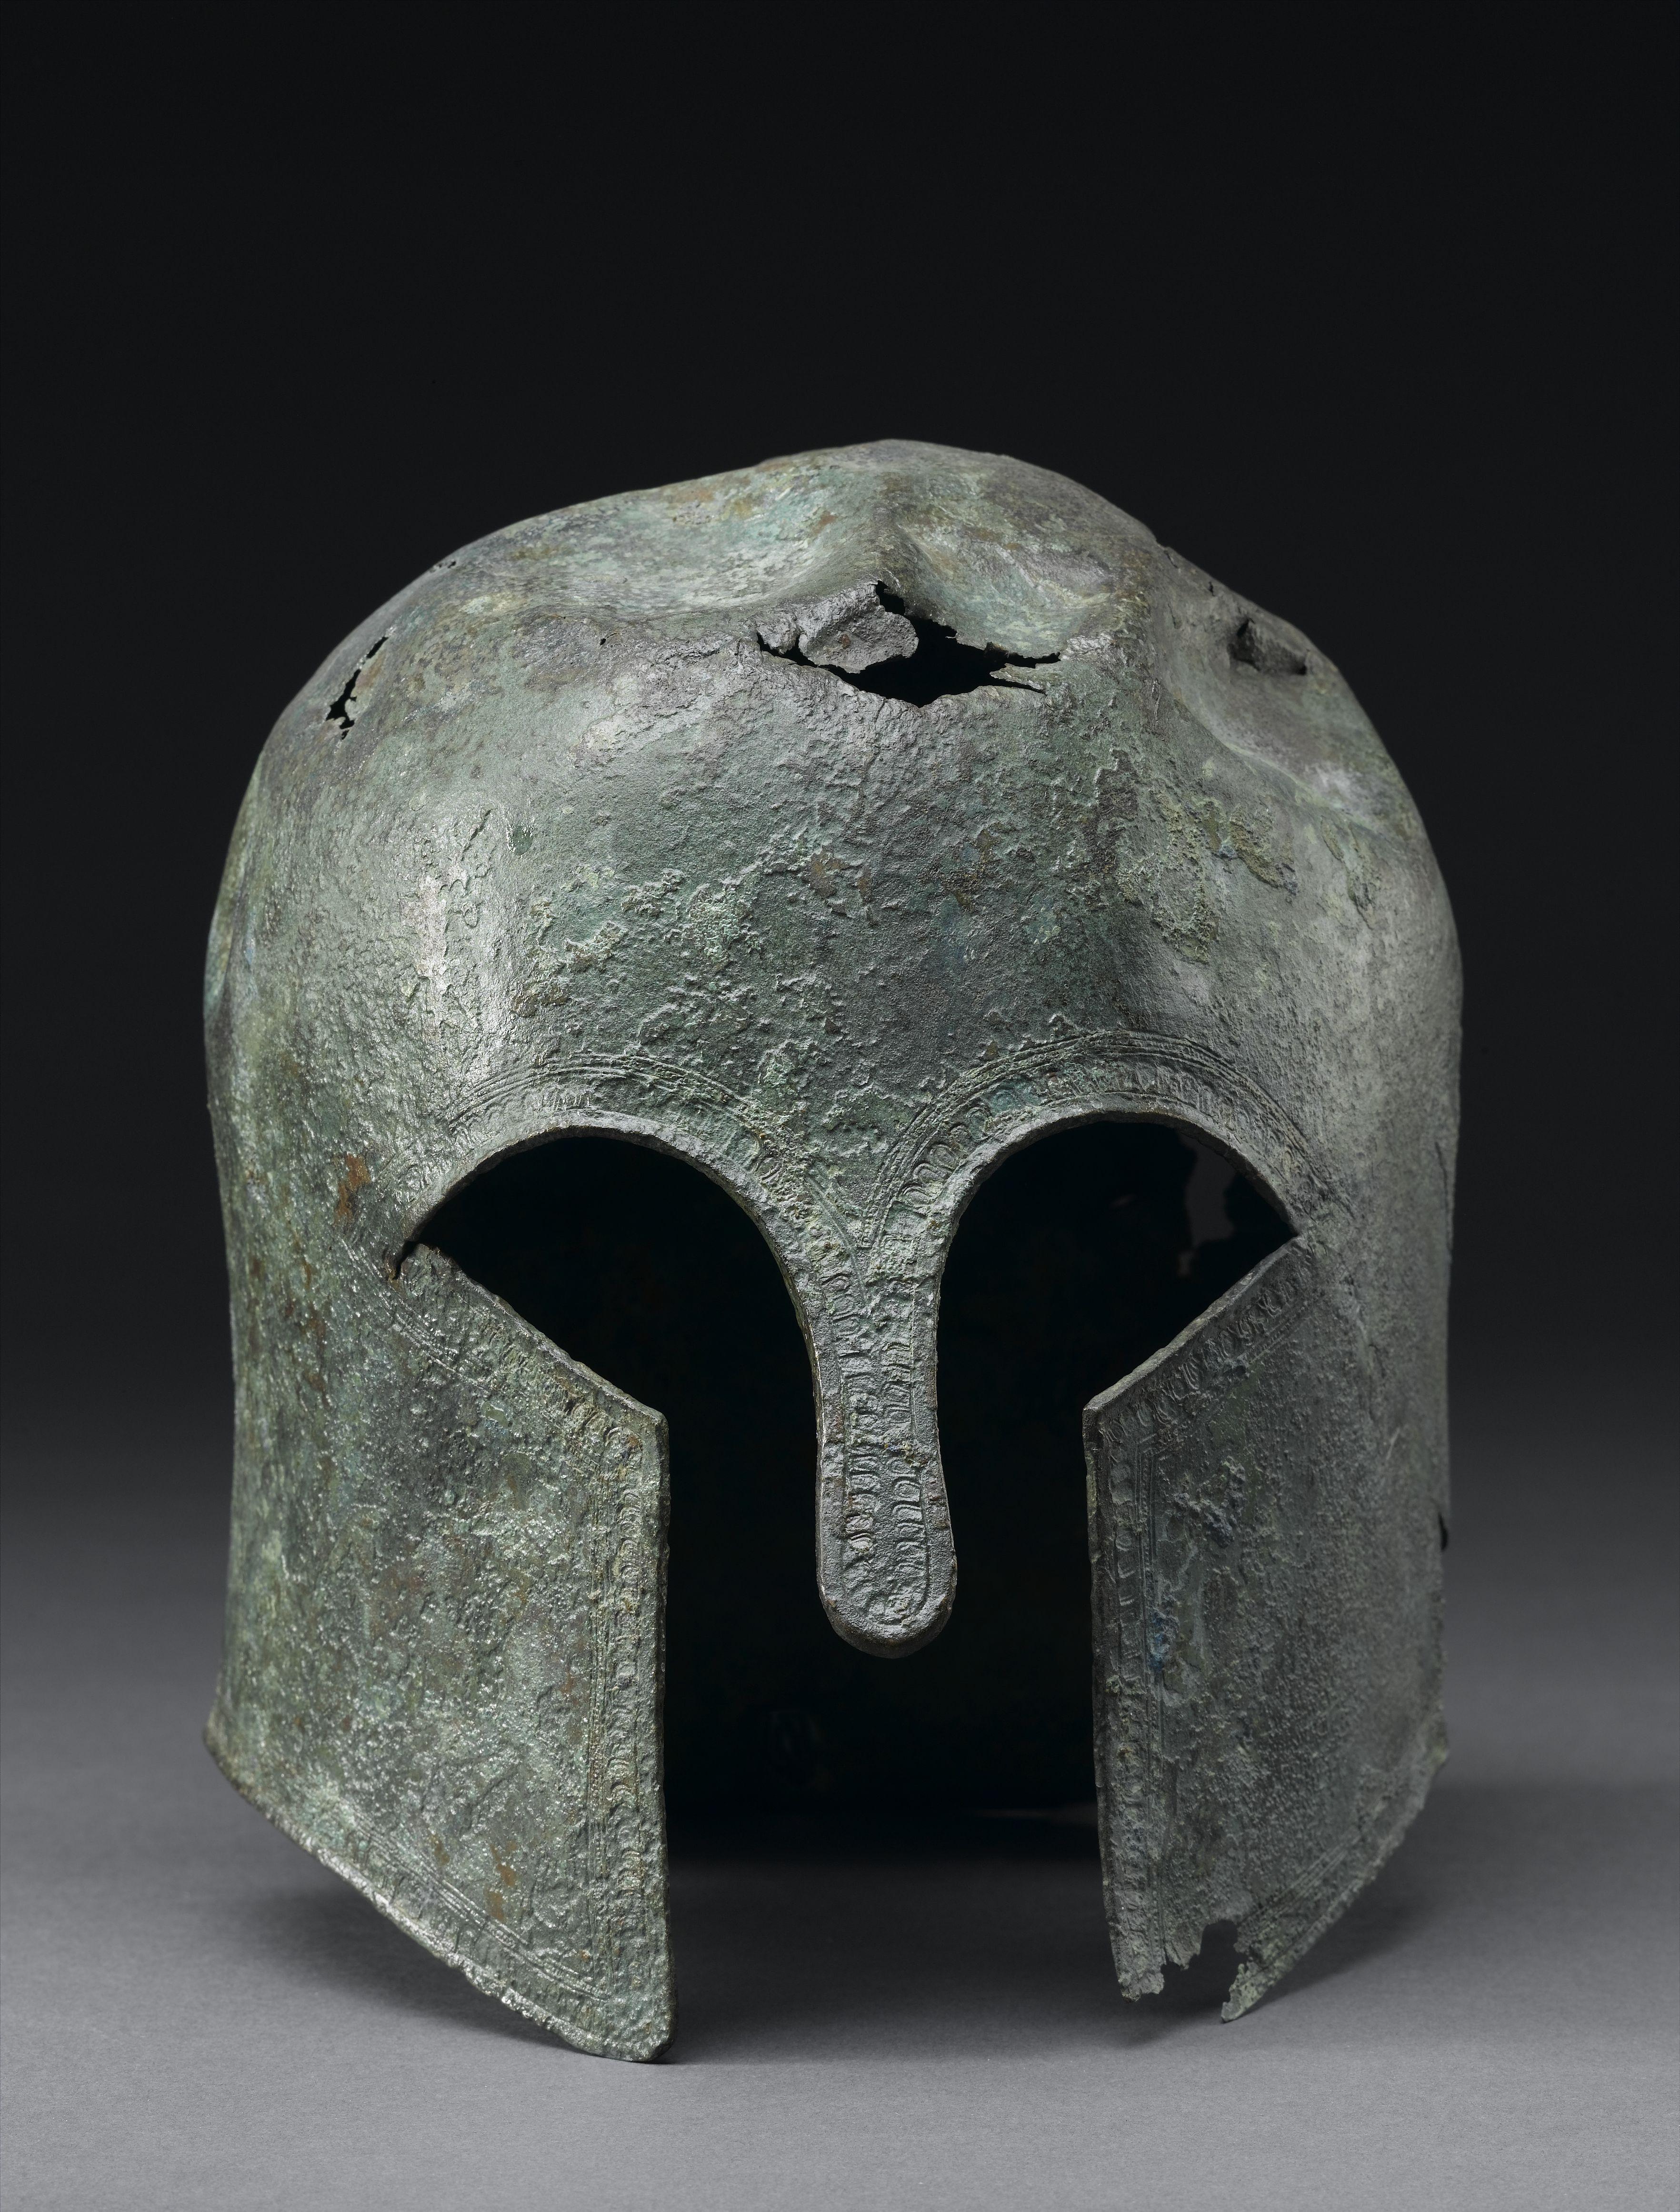 Corinthian helmet, Ancient Worlds gallery